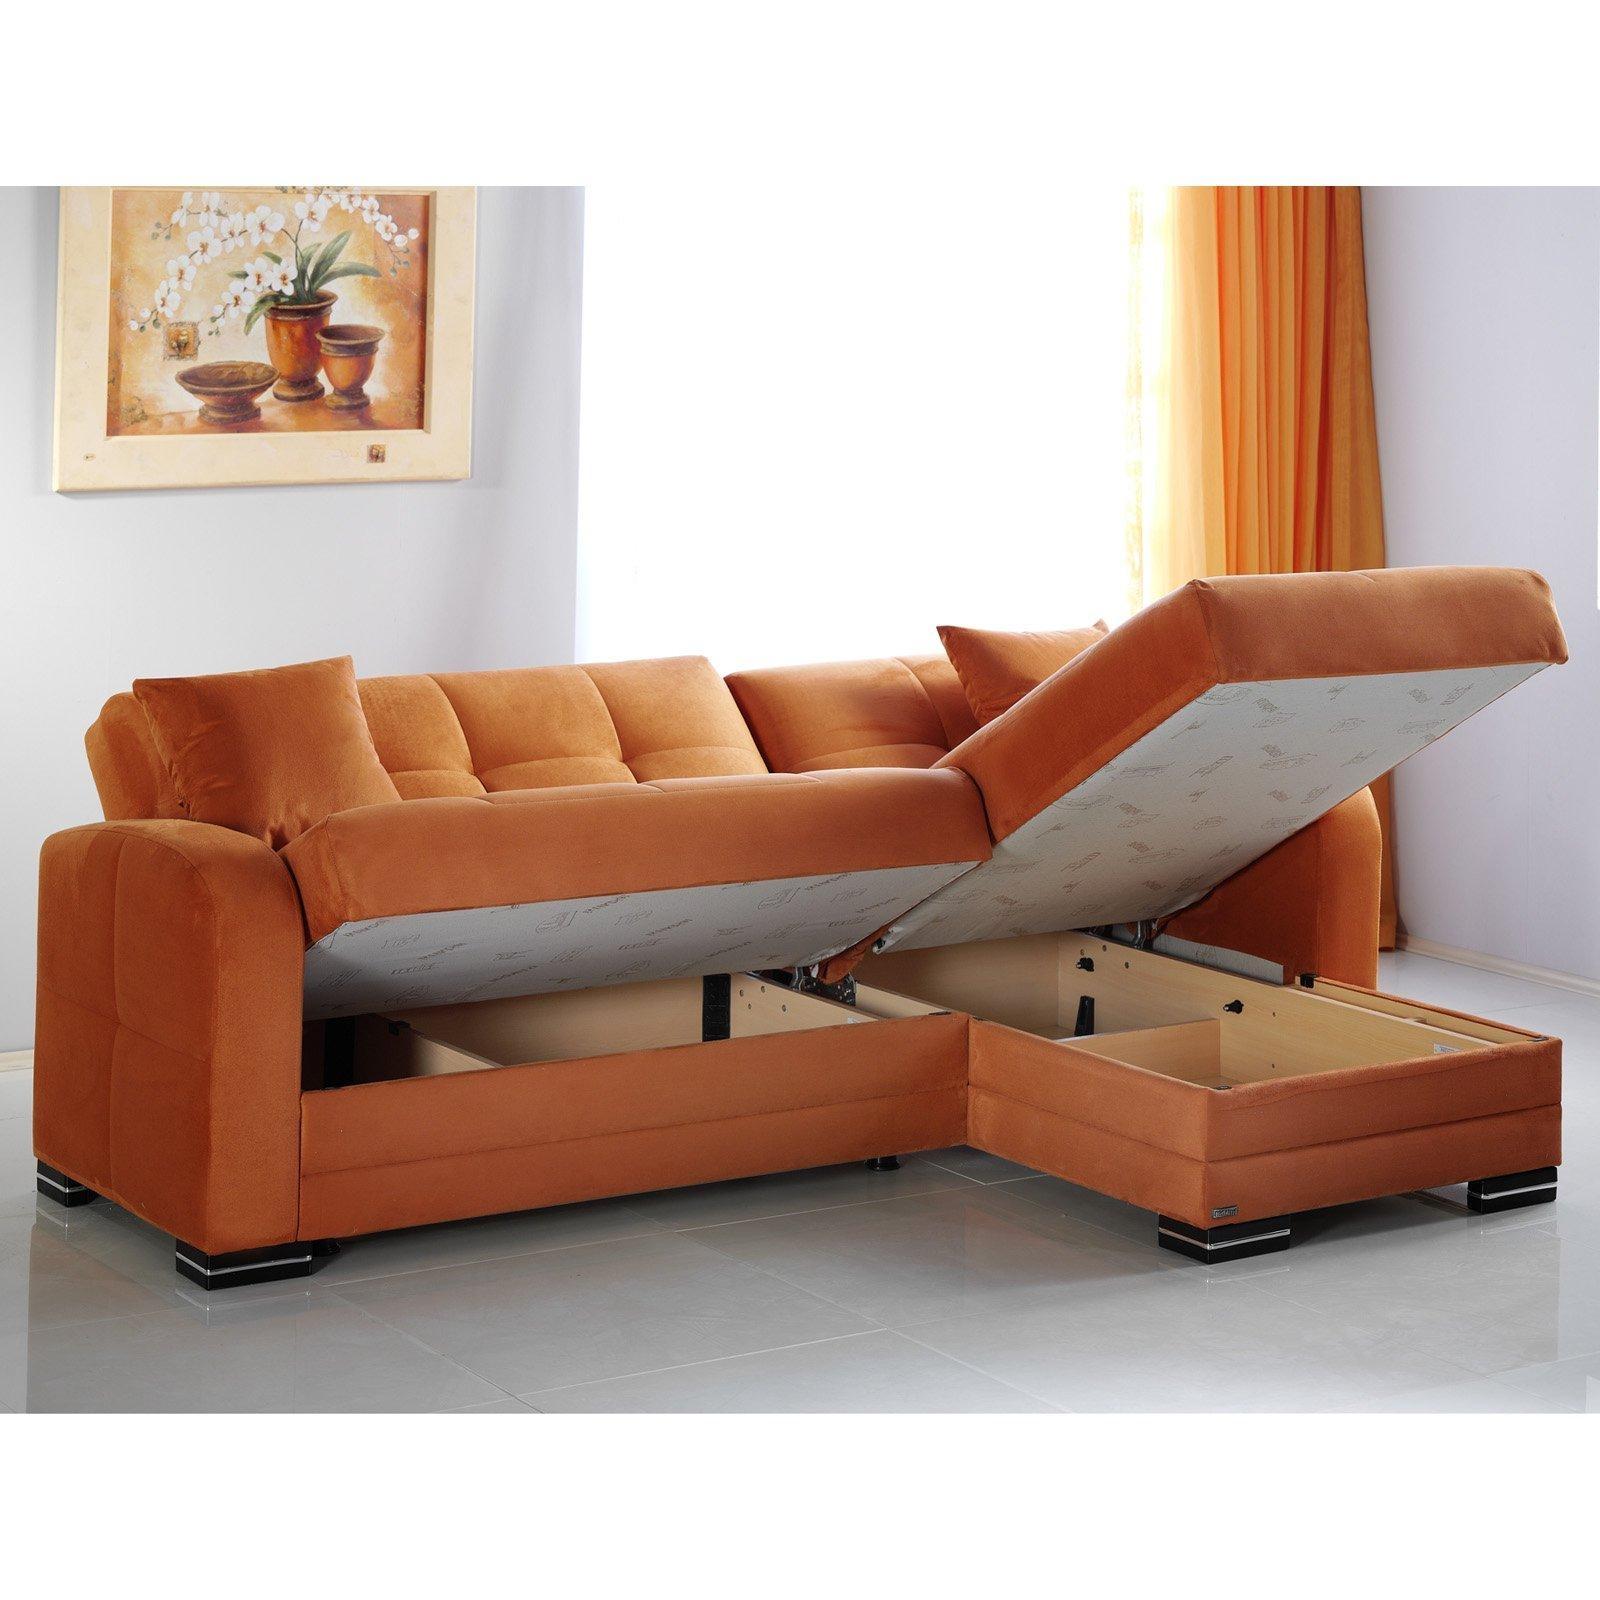 Istikbal Kubo Rainbow Orange Microfiber Sectional Sofa – Walmart Regarding Burnt Orange Sofas (Image 6 of 20)